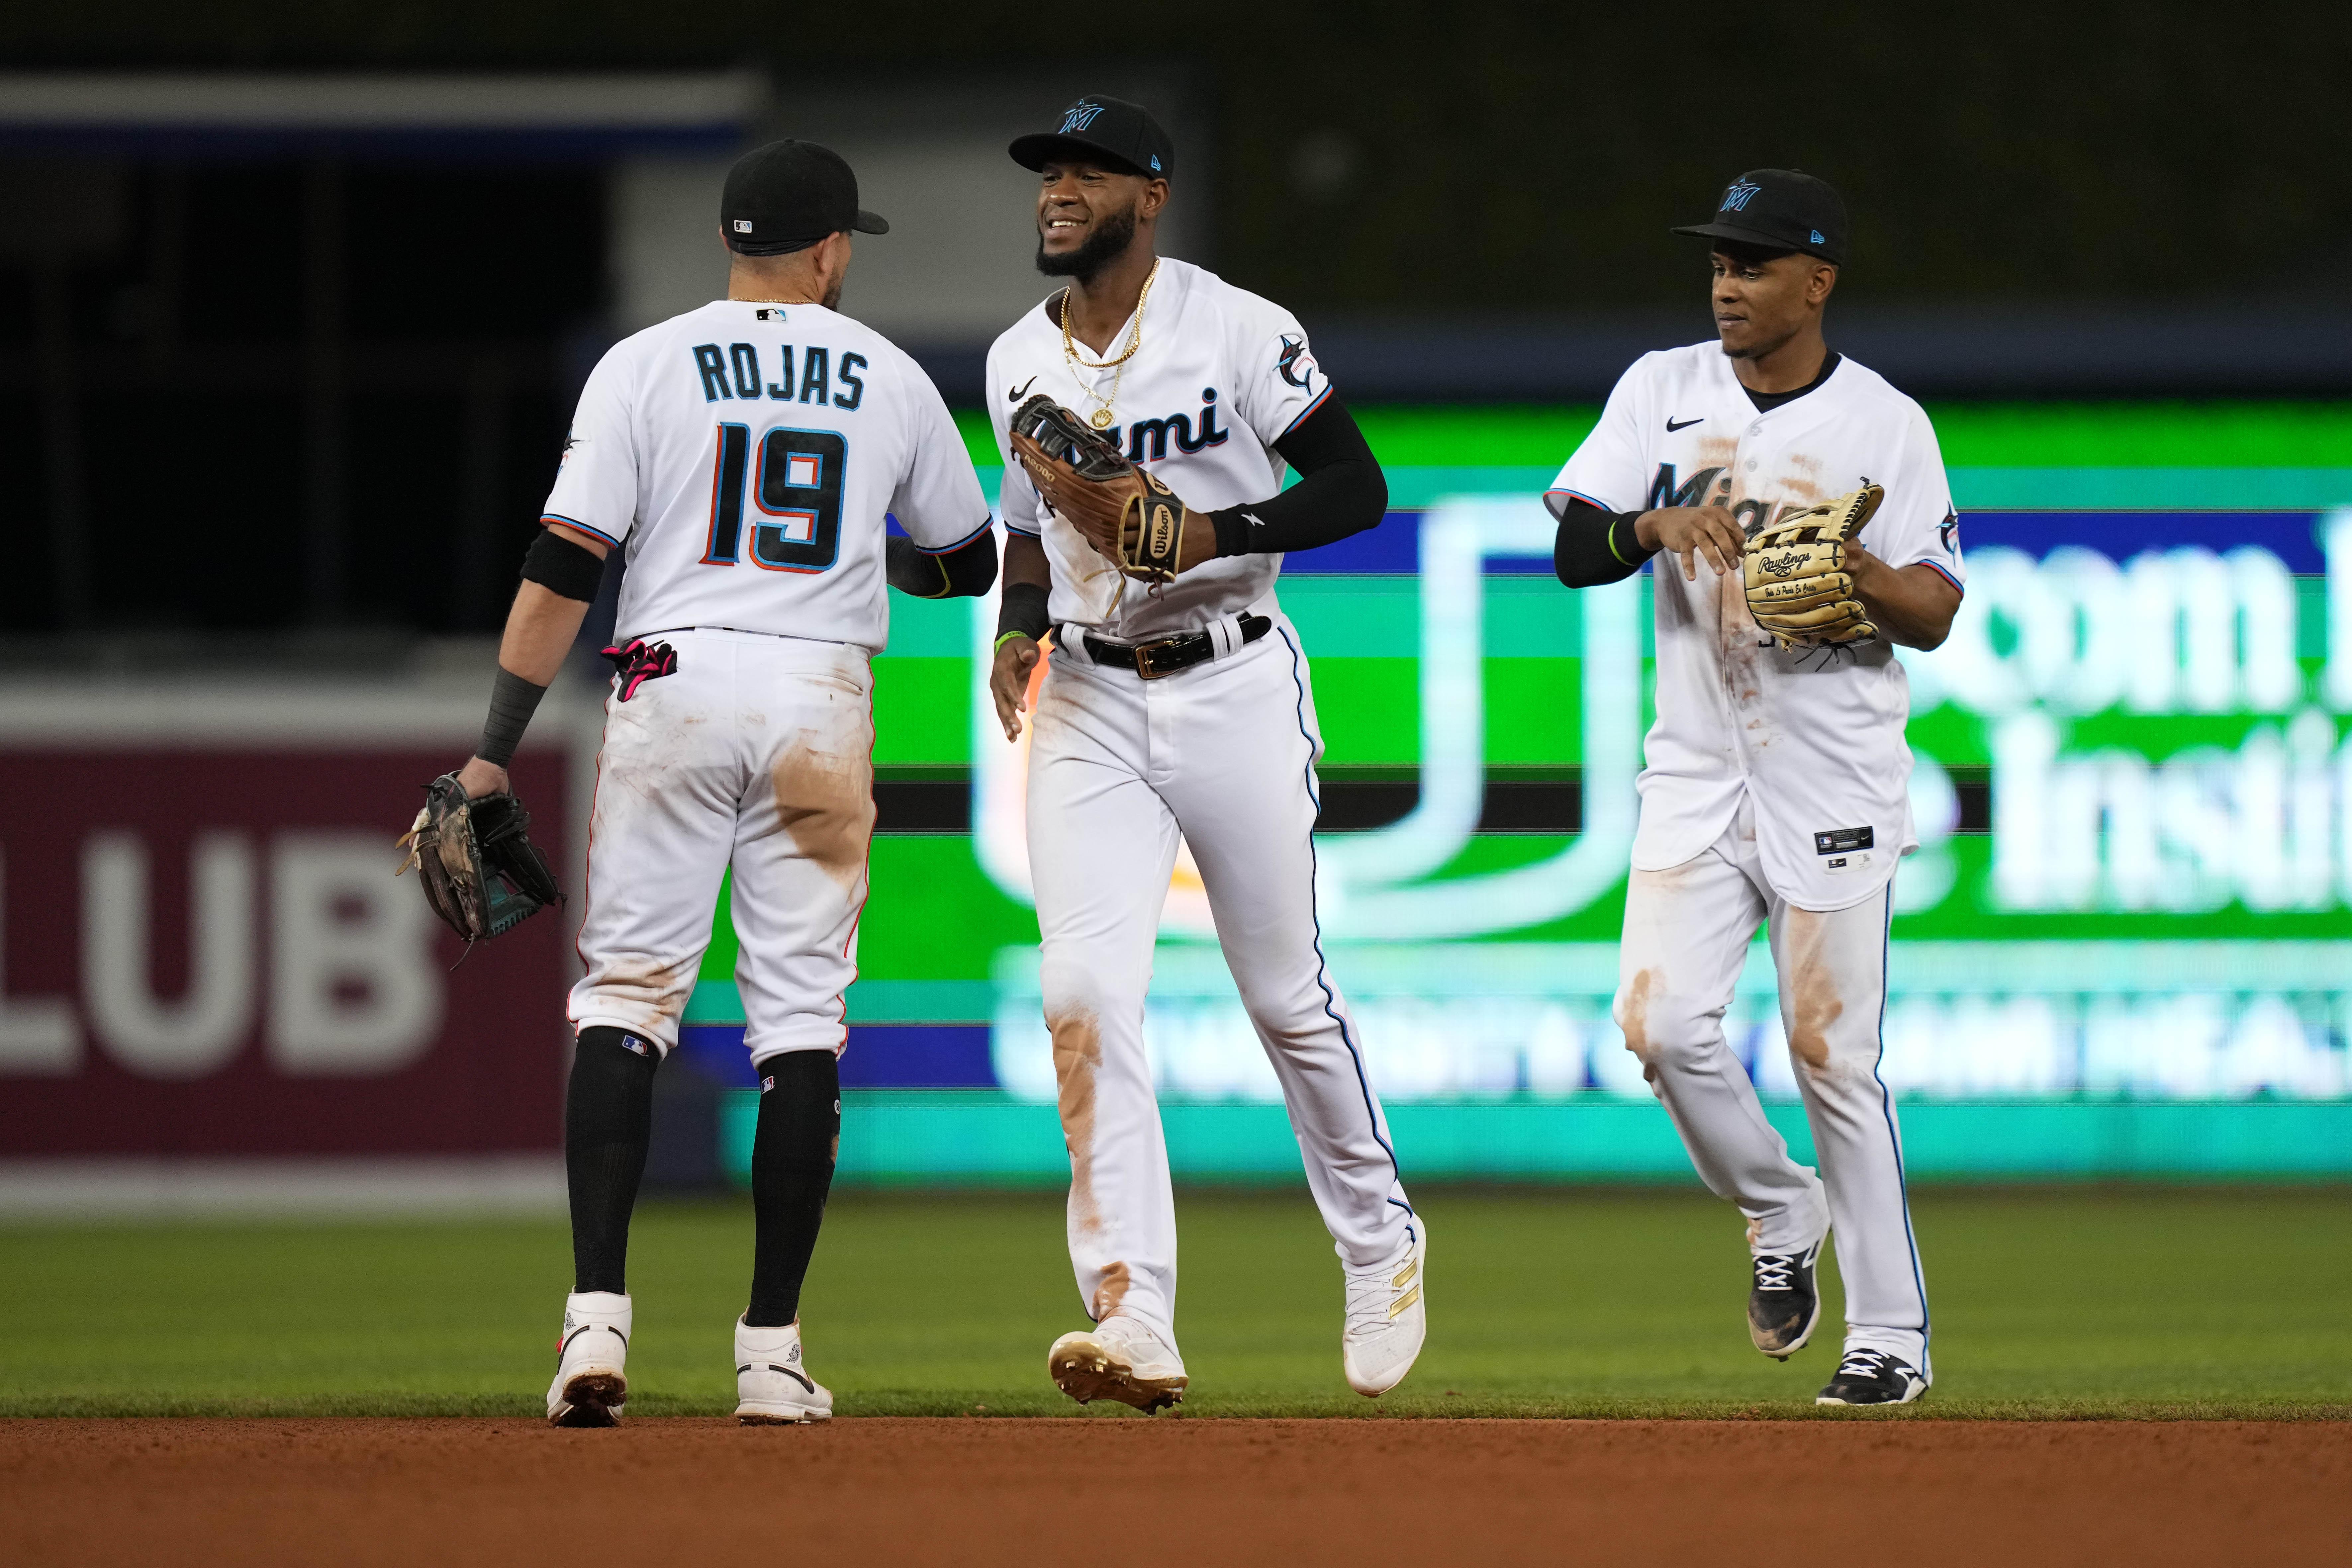 Miami Marlins shortstop Miguel Rojas (19), left fielder Bryan De La Cruz (77) and center fielder Magneuris Sierra (34) celebrate after defeating the Washington Nationals at loanDepot park